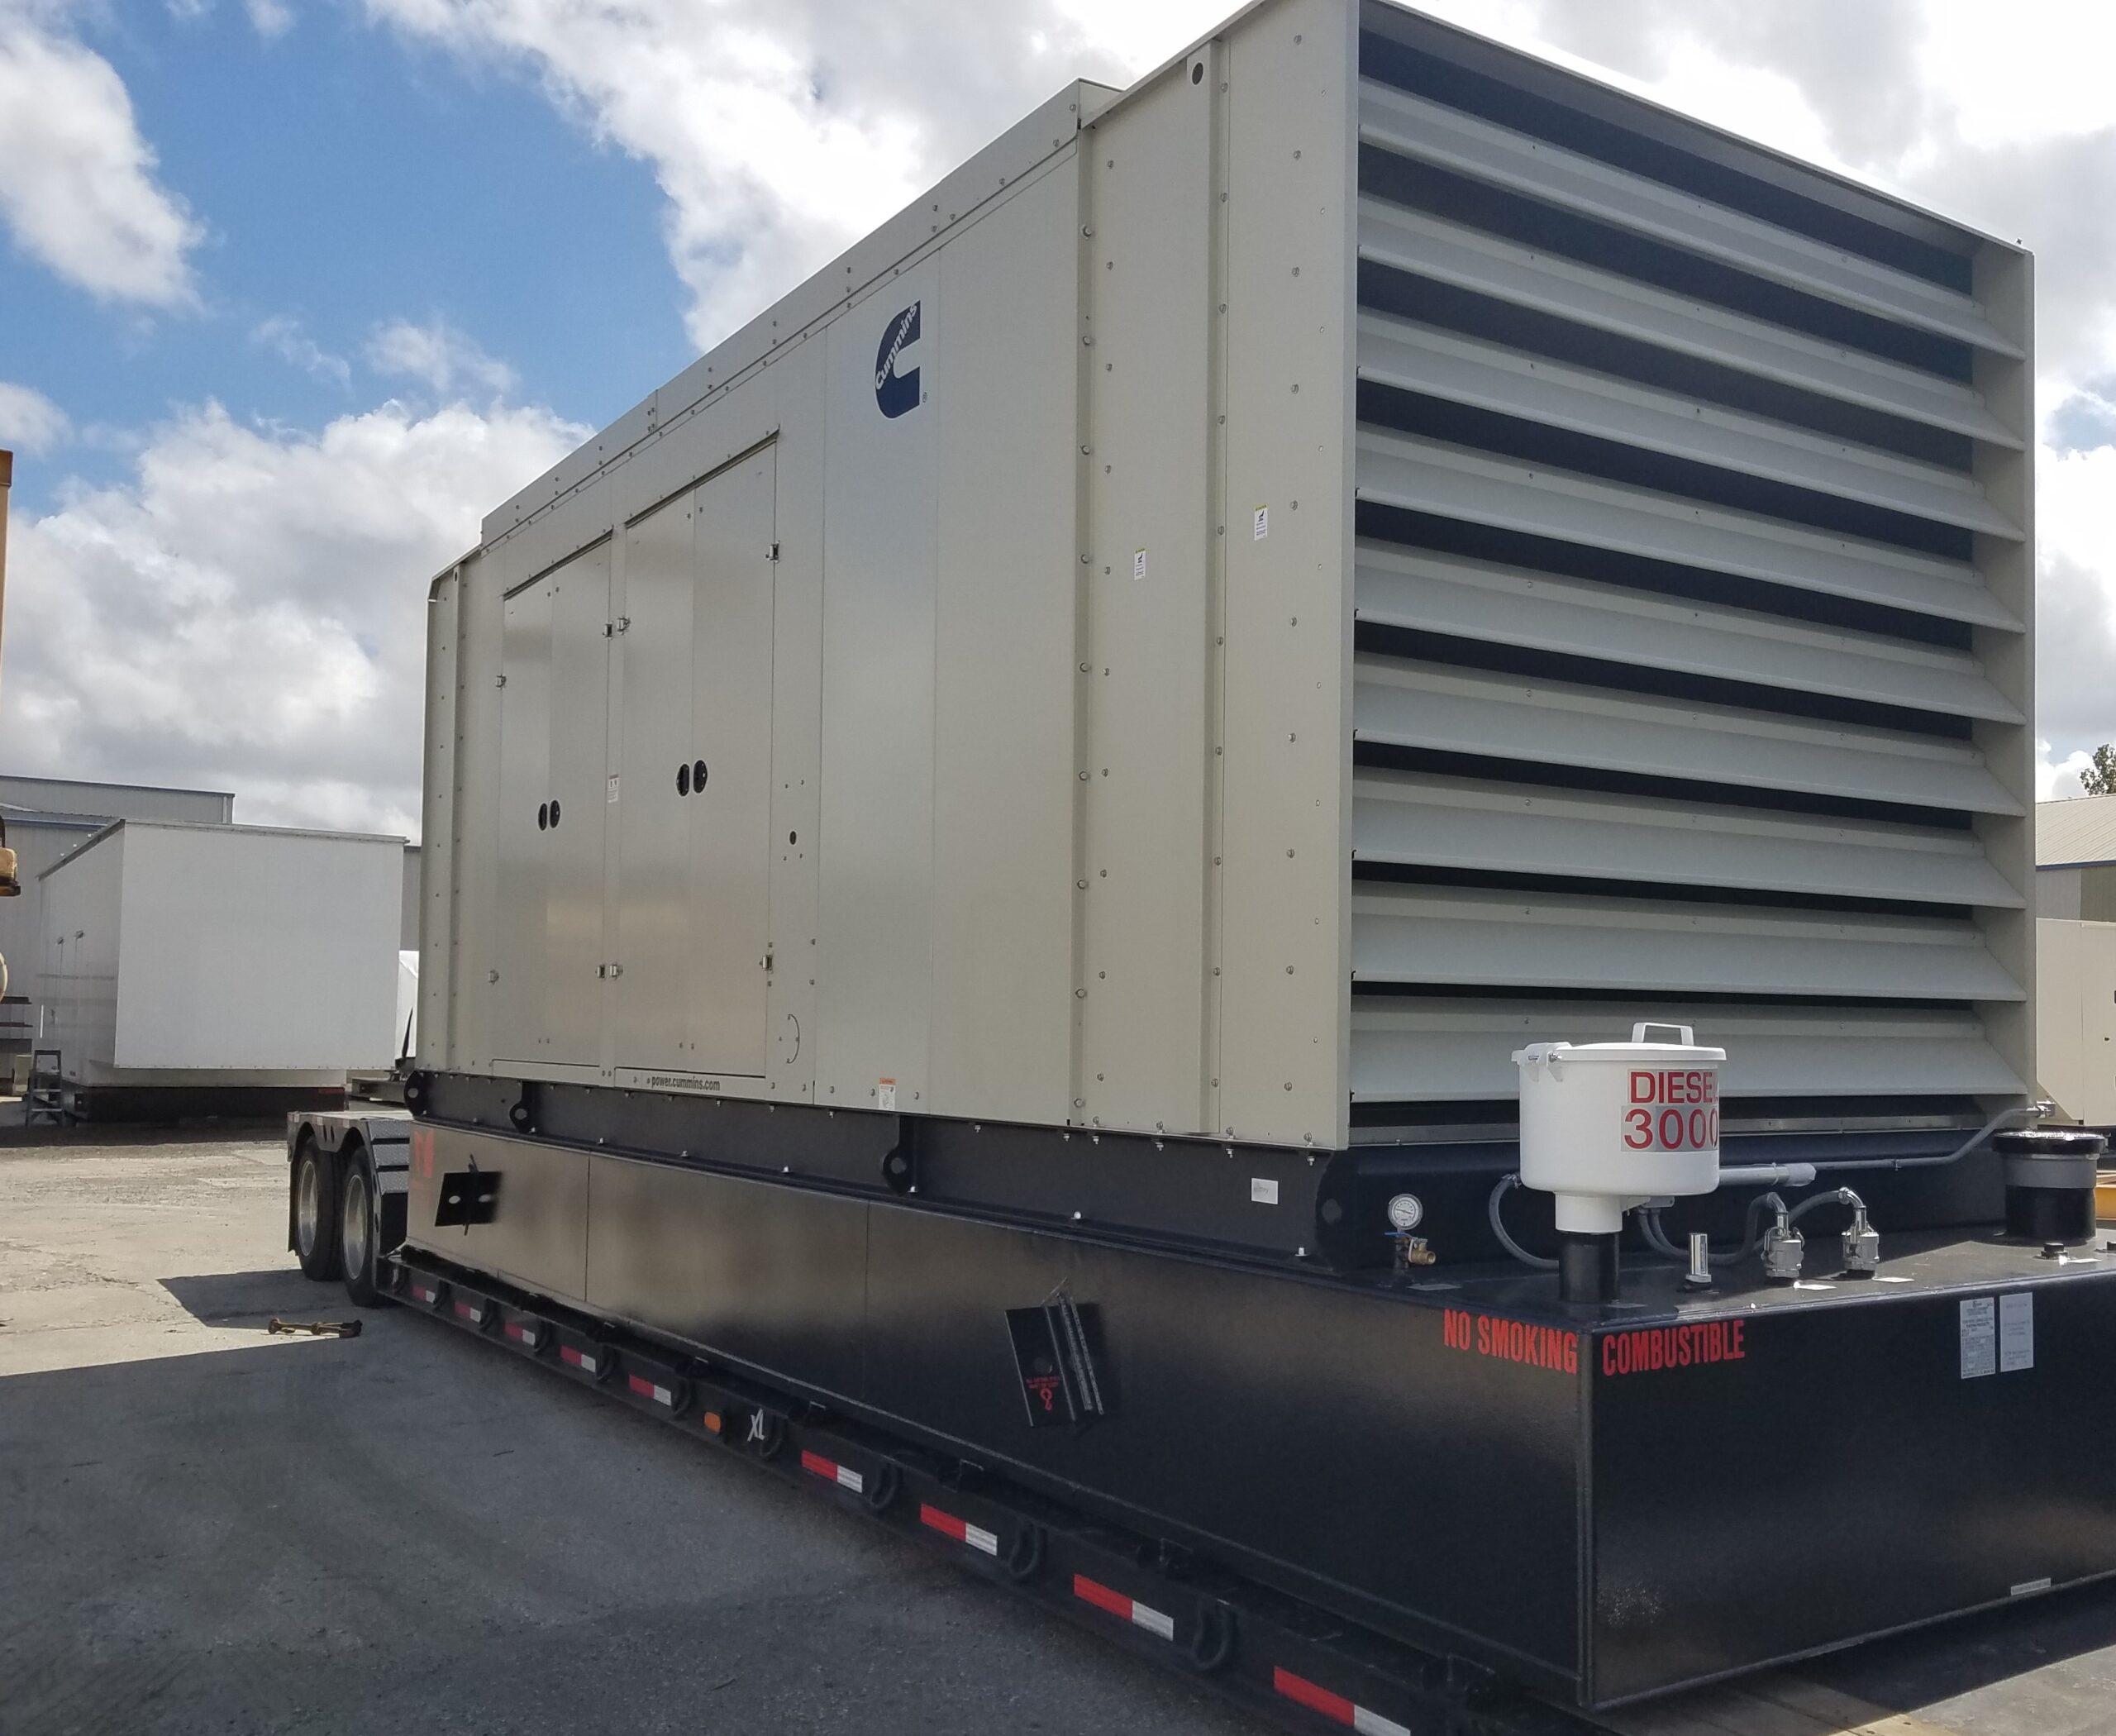 Cummins-Factory-Generator-Enclosure-With-UL-Sub-Base-Fuel-Tank